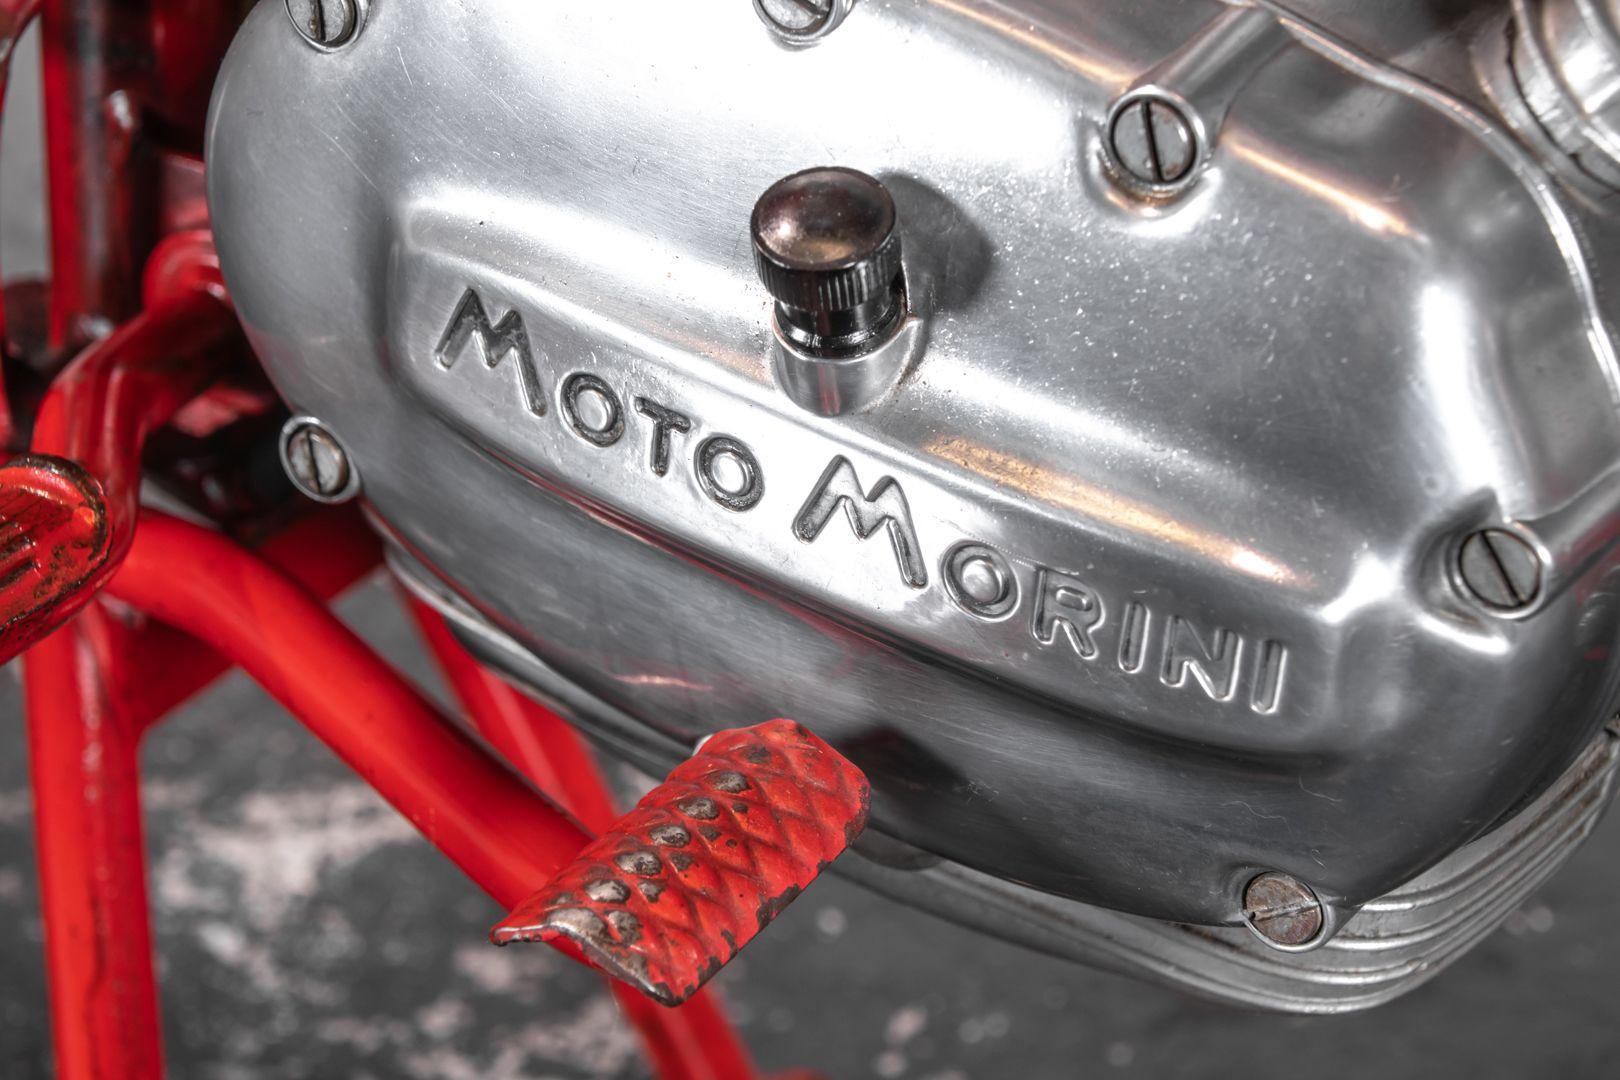 1967 Moto Morini Corsarino ZZ 77562